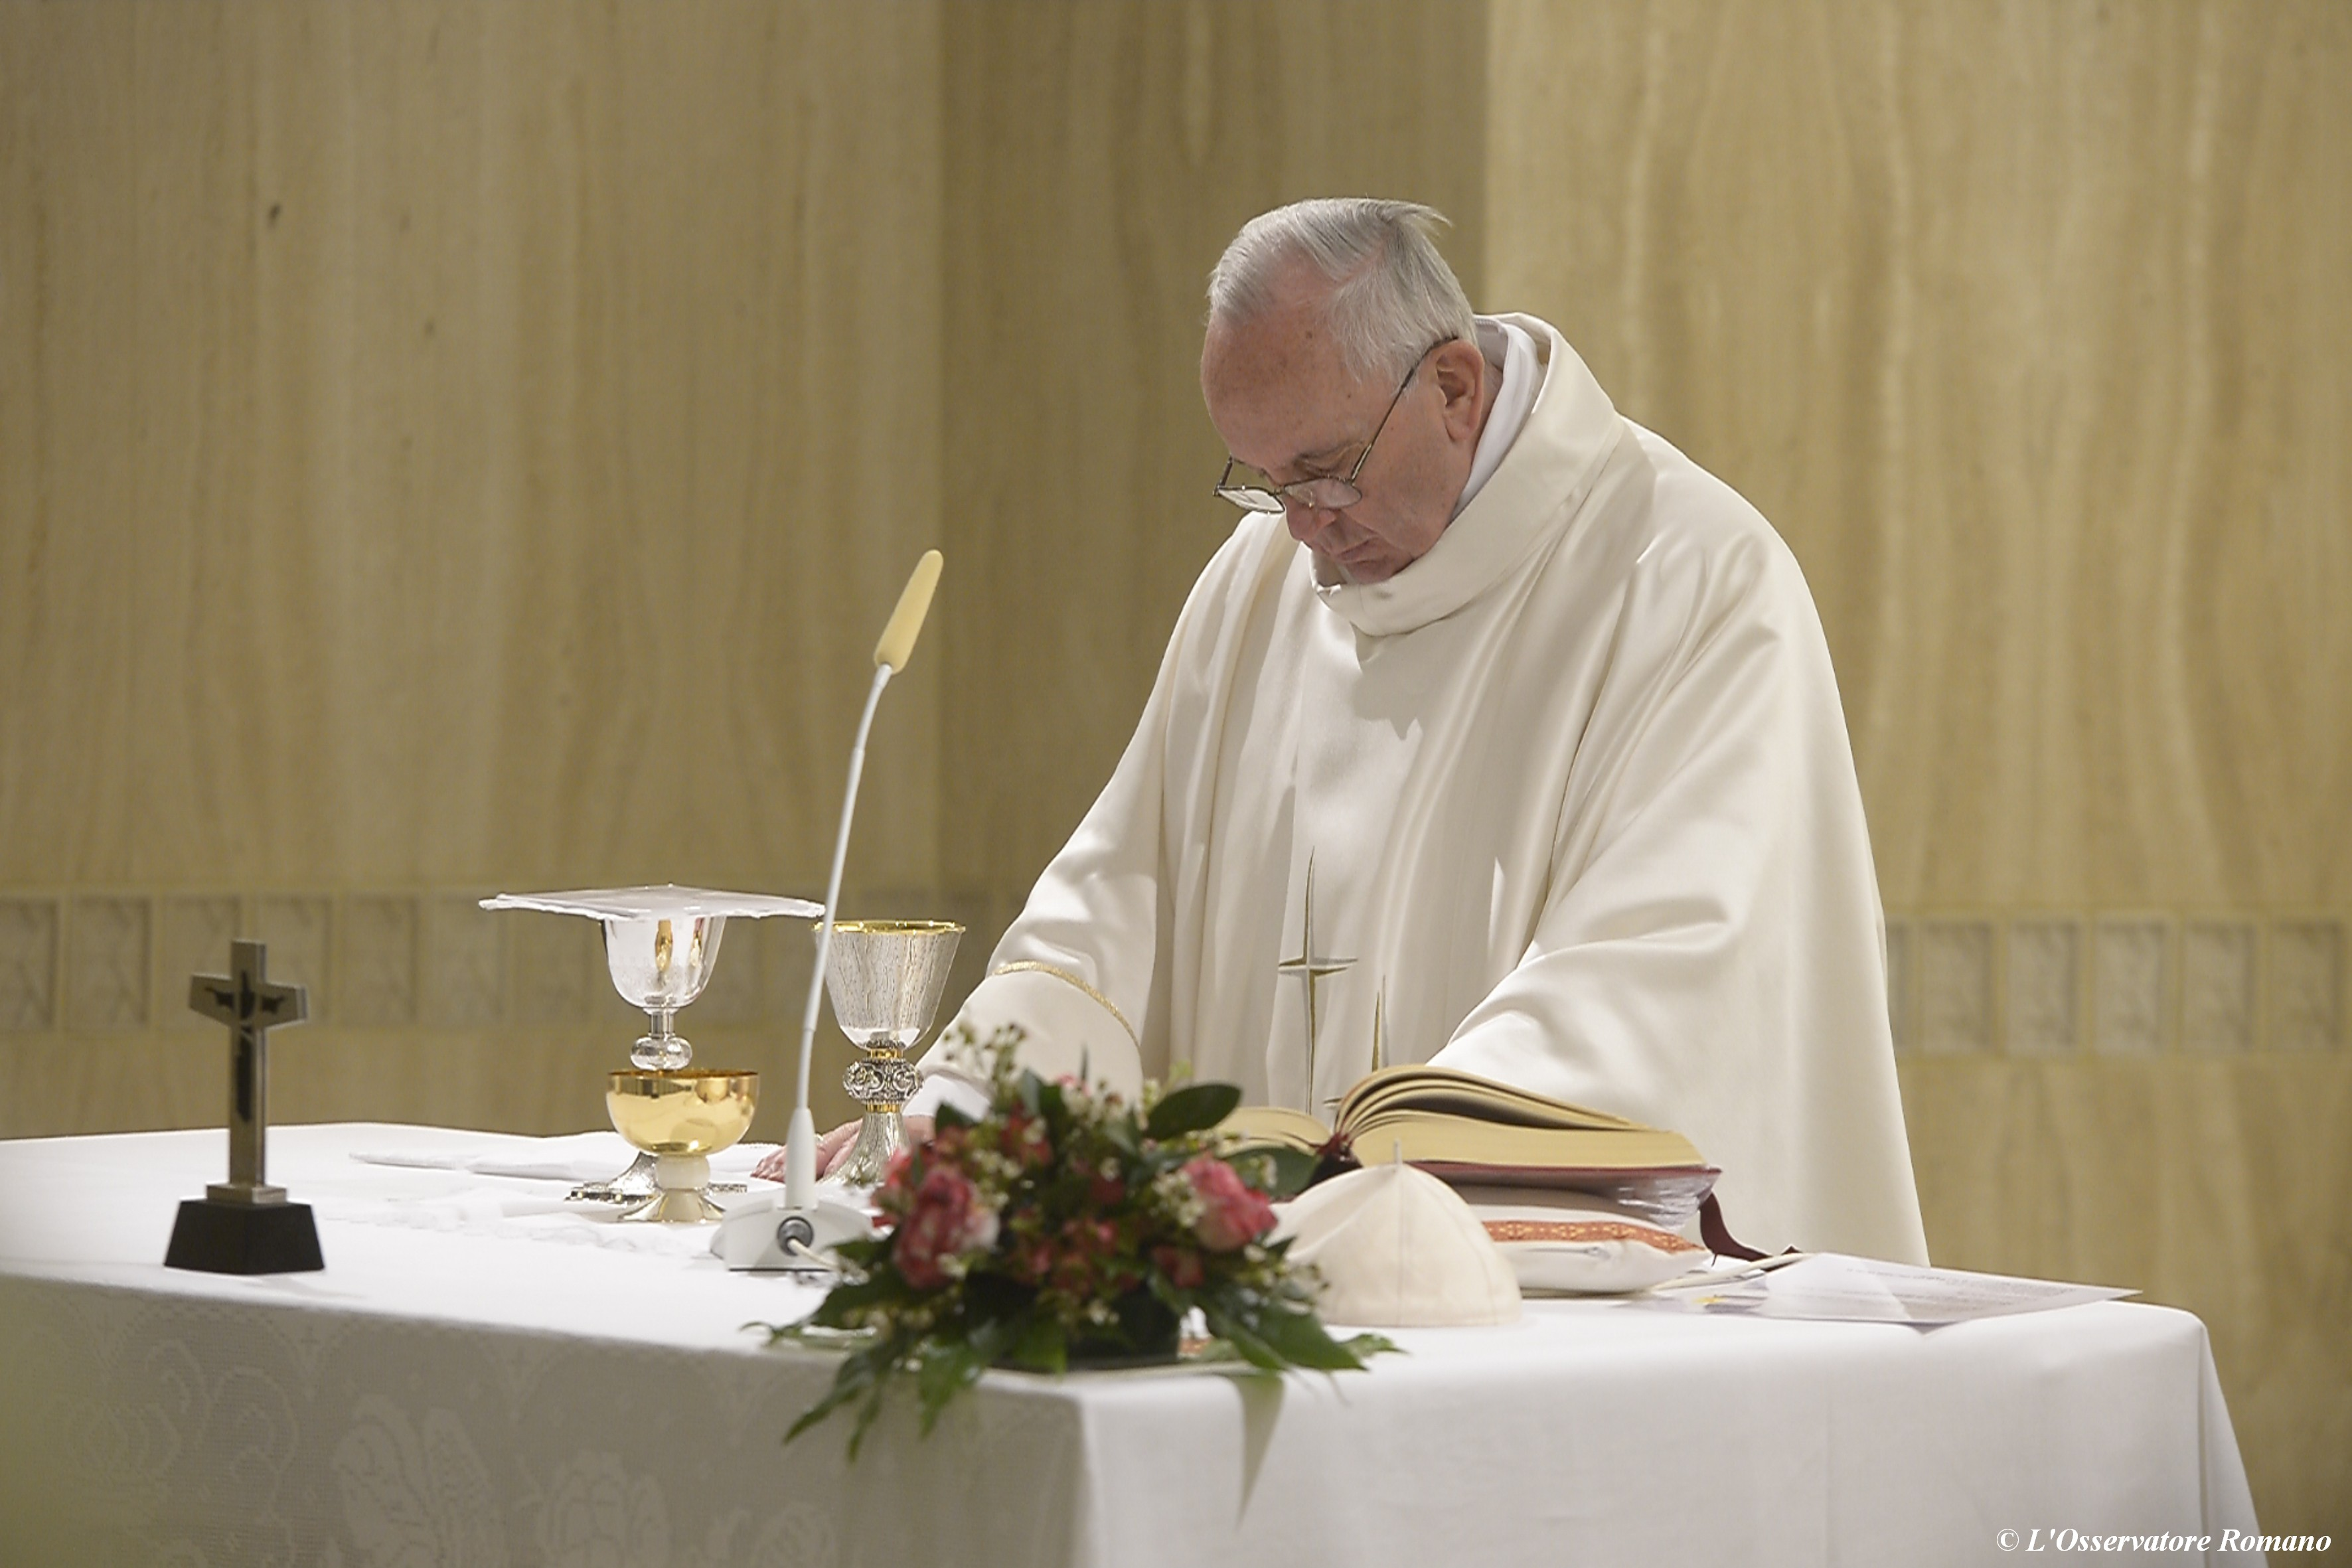 Pope Francis celebrates Mass in the Domus Sanctae Marthae